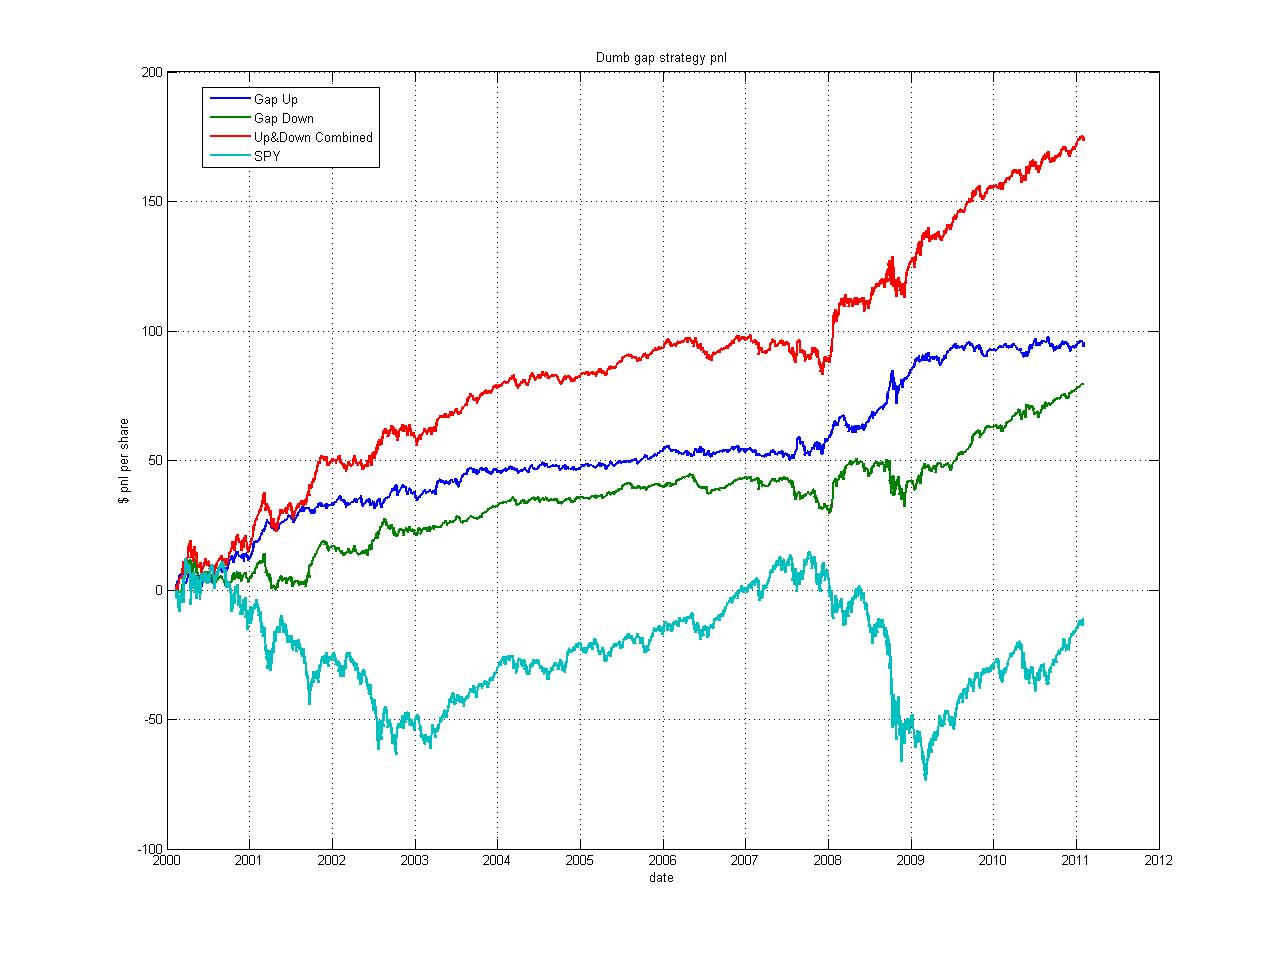 J gap trading strategies